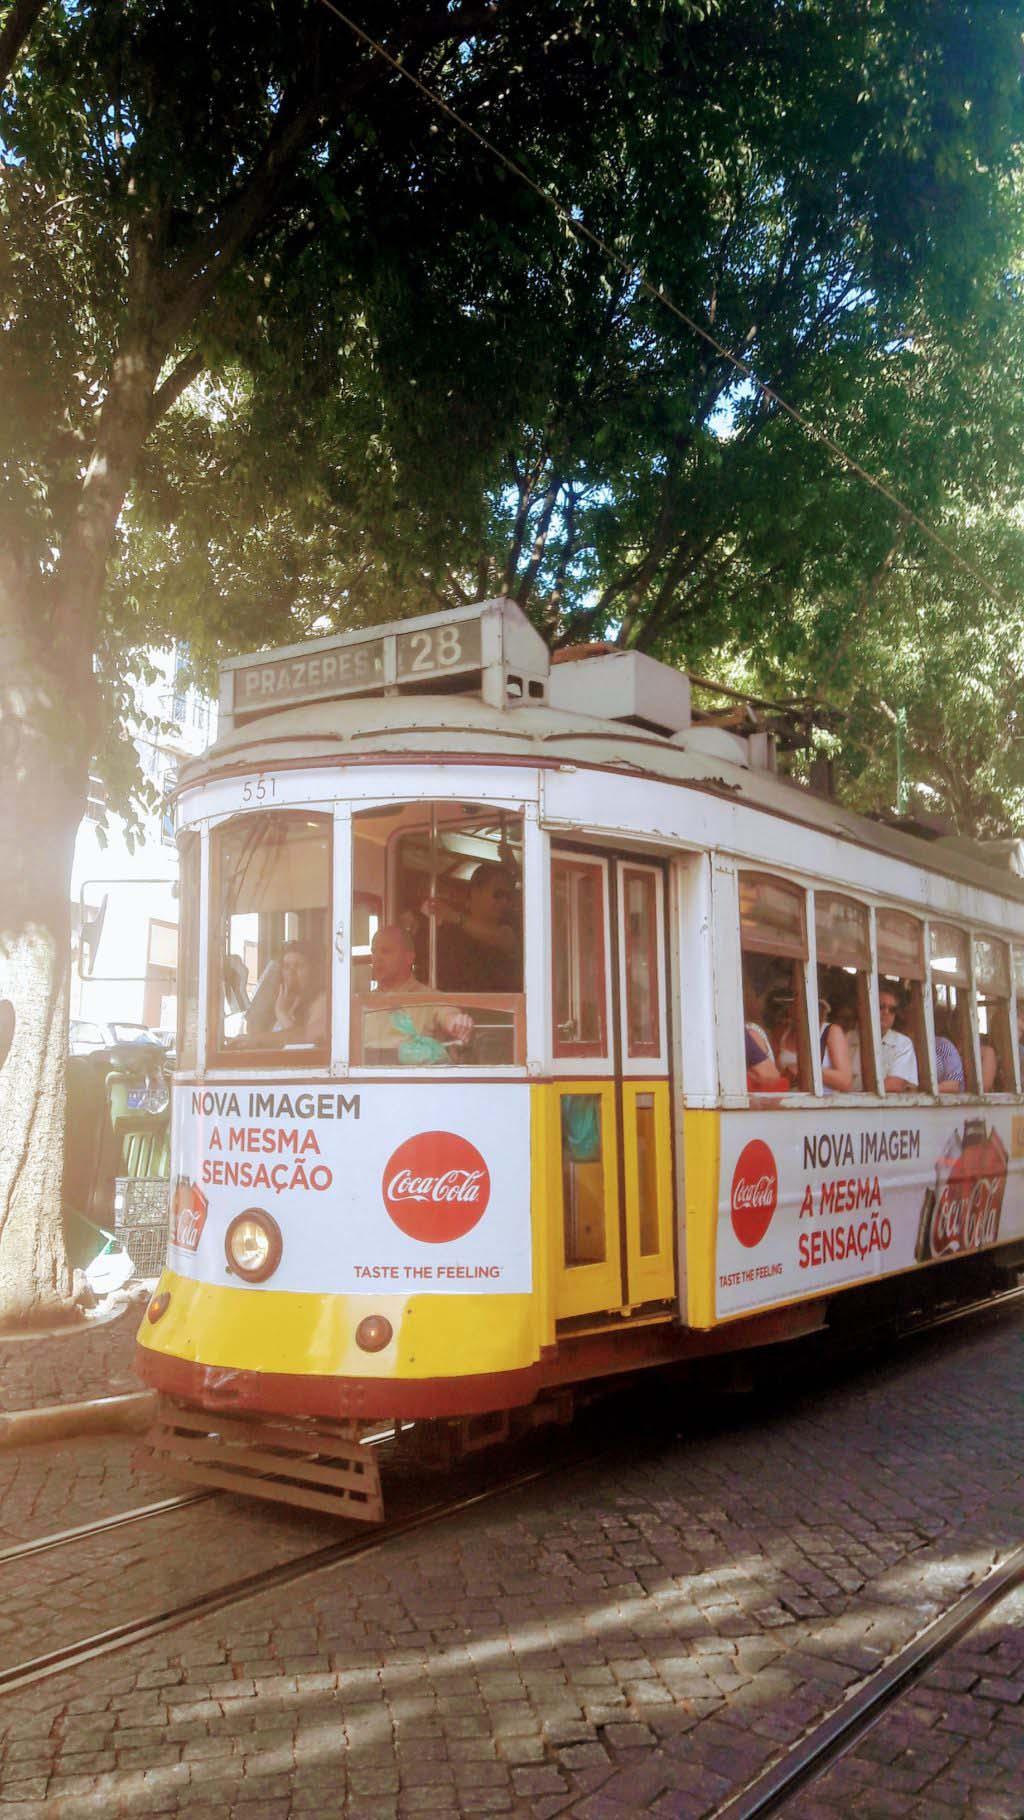 Lisbon by tram line 28E